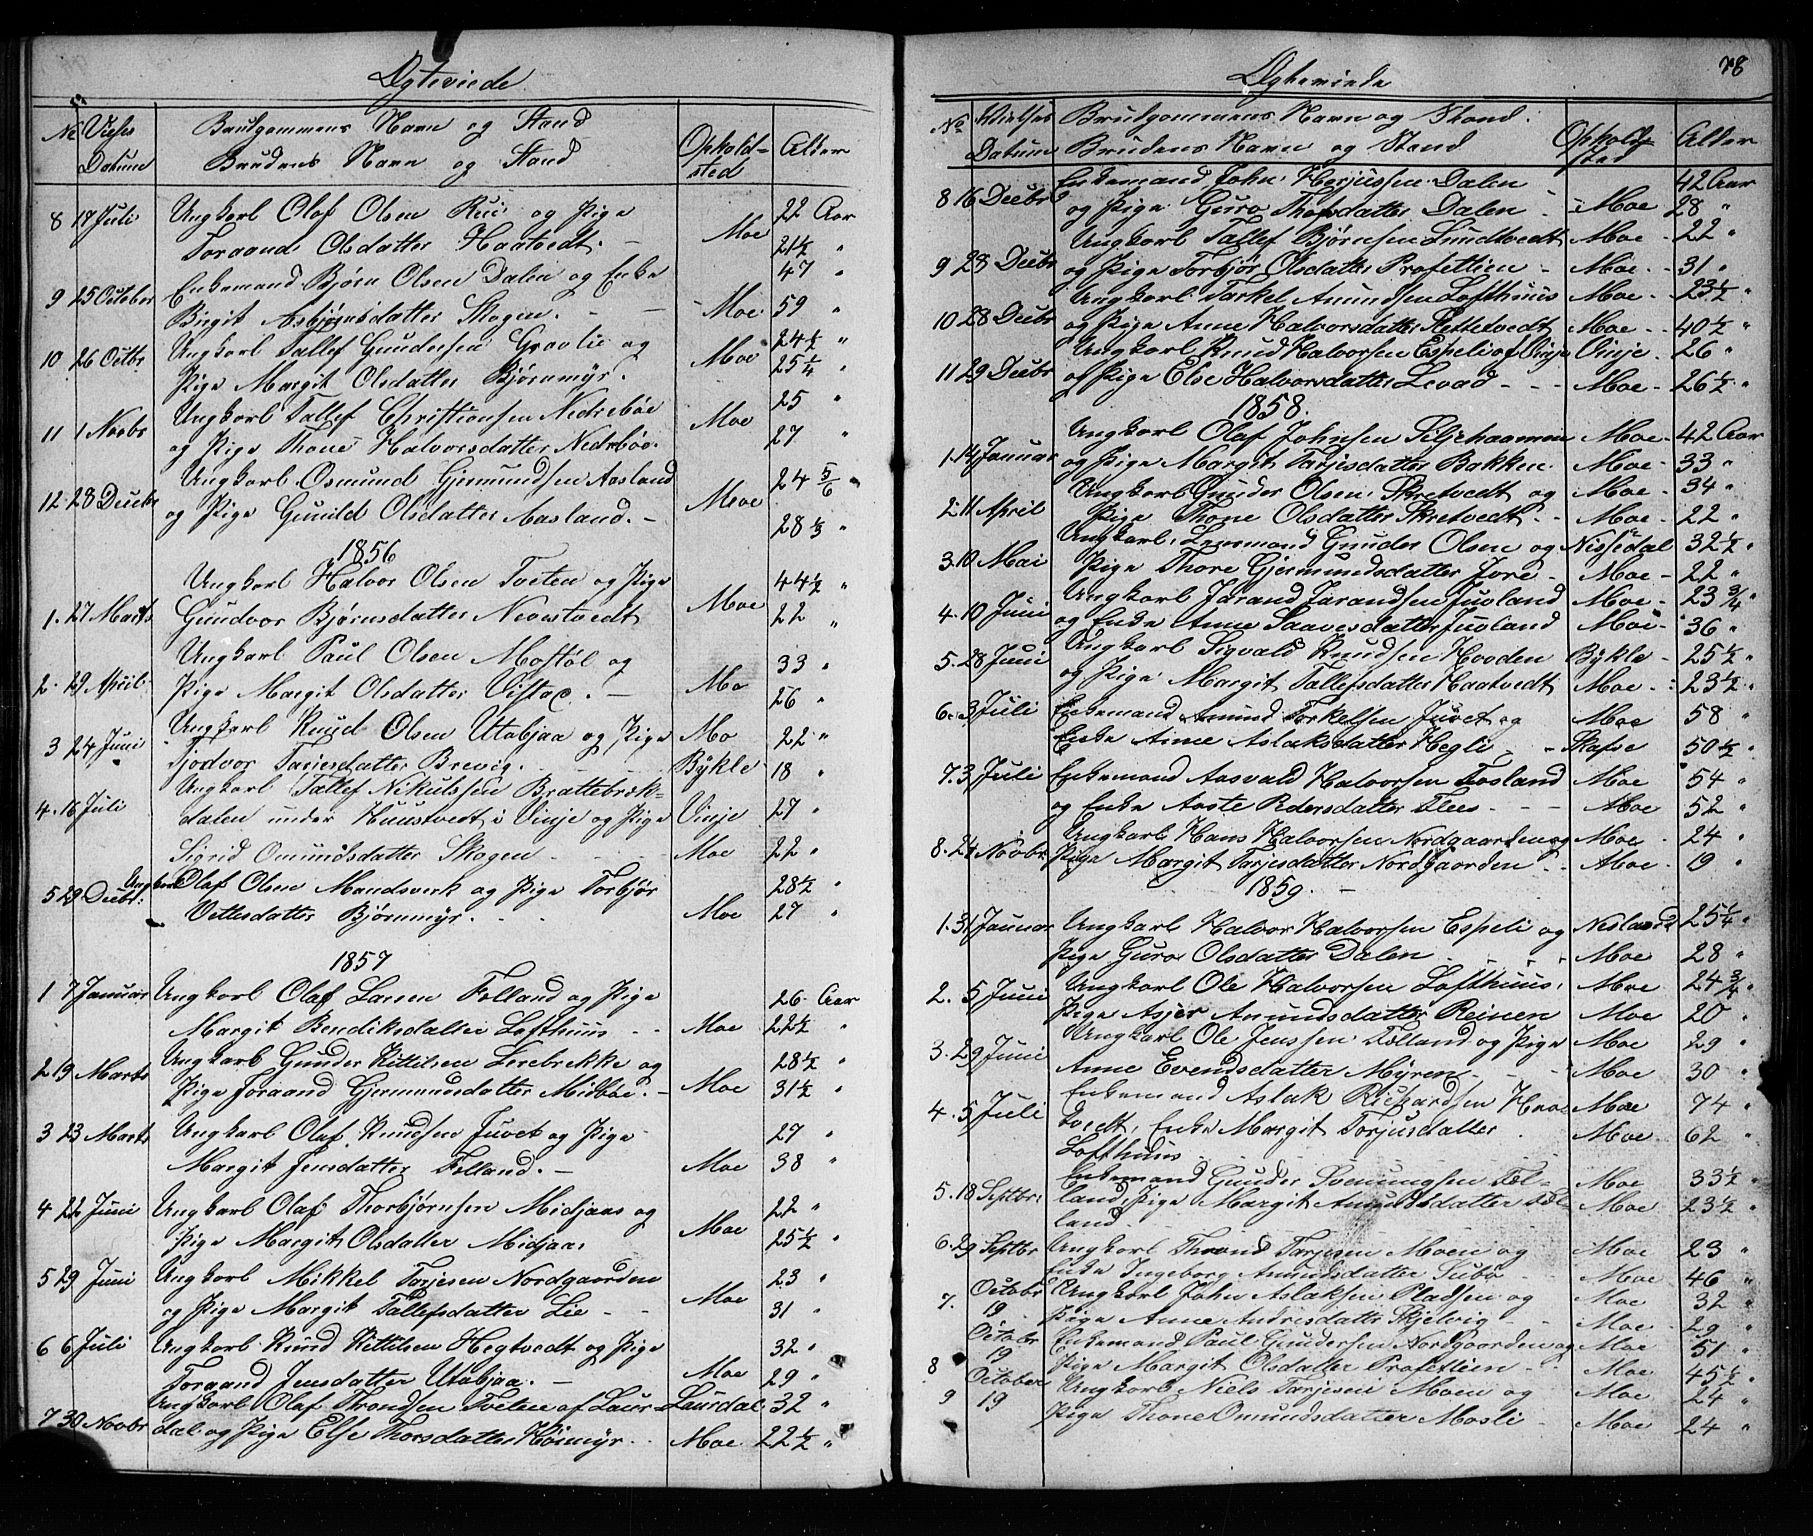 SAKO, Mo kirkebøker, G/Ga/L0001: Klokkerbok nr. I 1, 1851-1891, s. 78